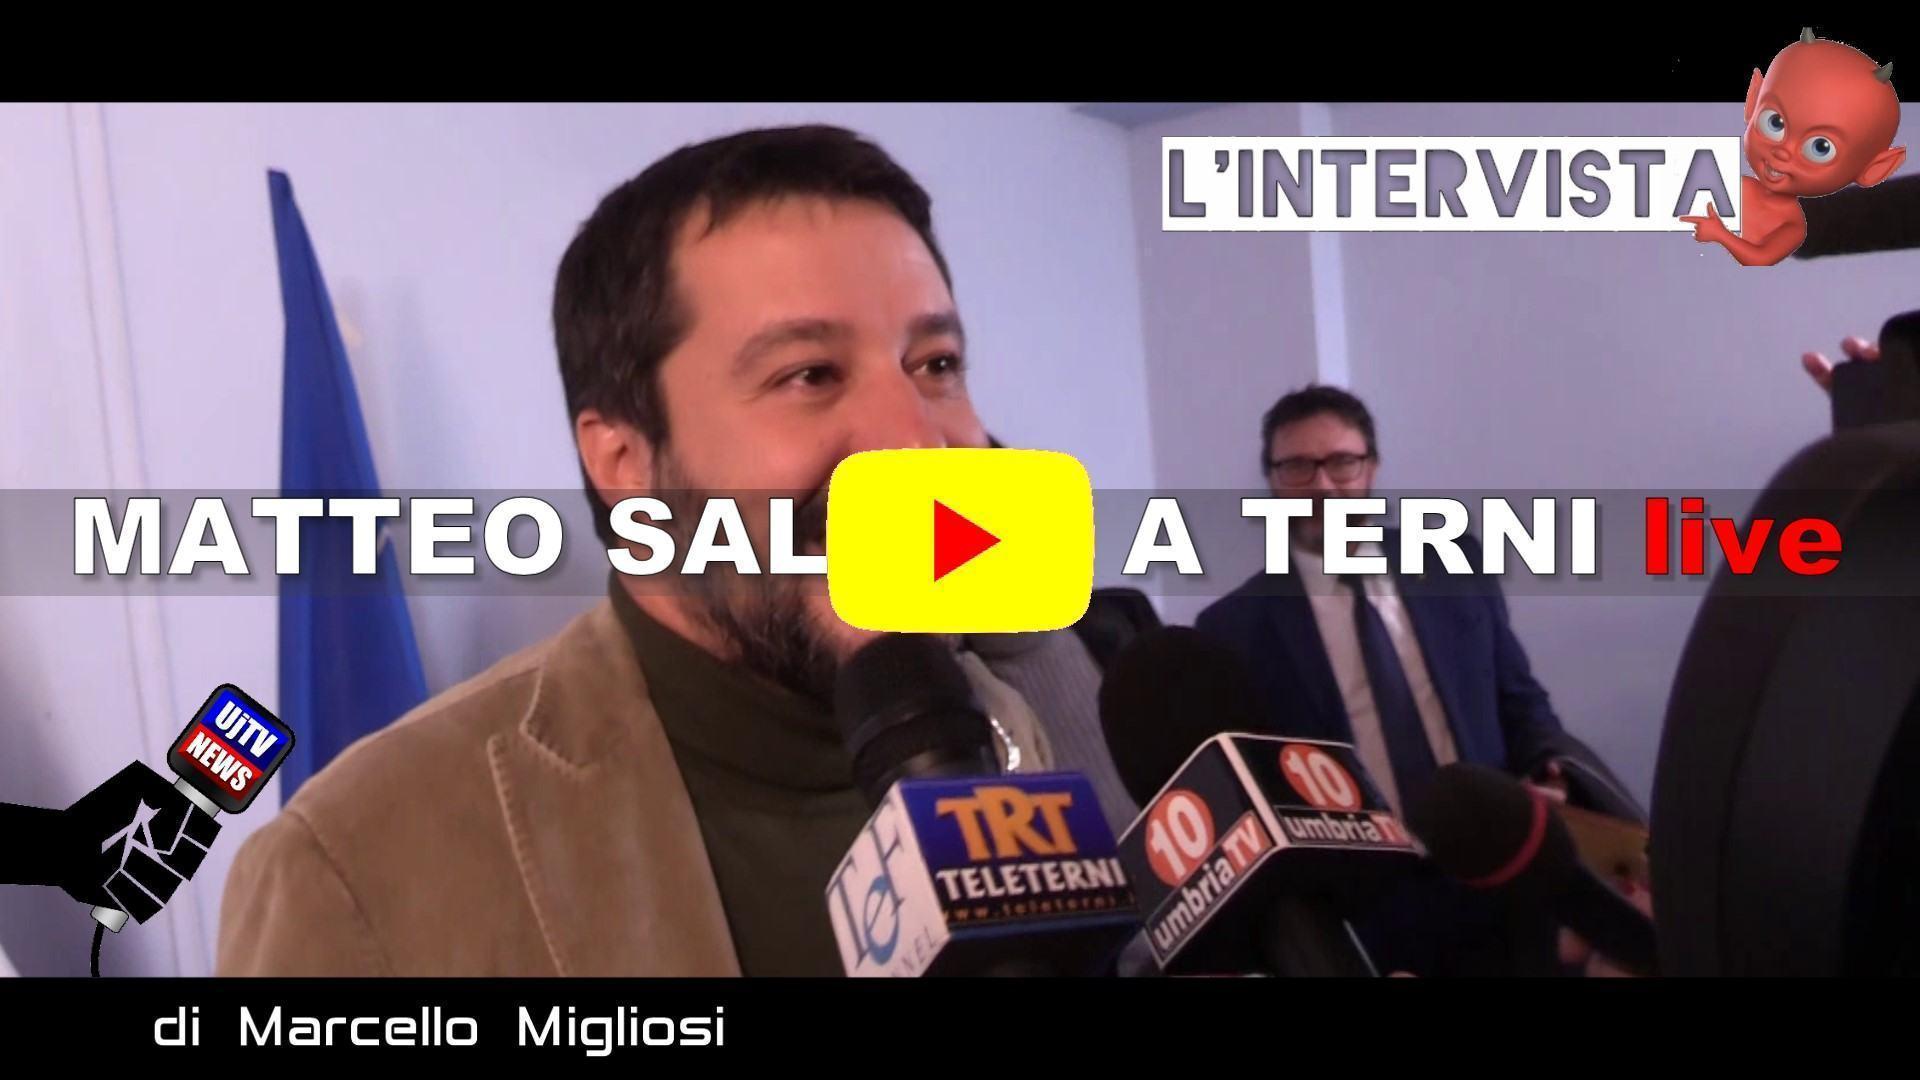 Matteo Salvini a Terni dopo vittoria elezioni regionali, intervista